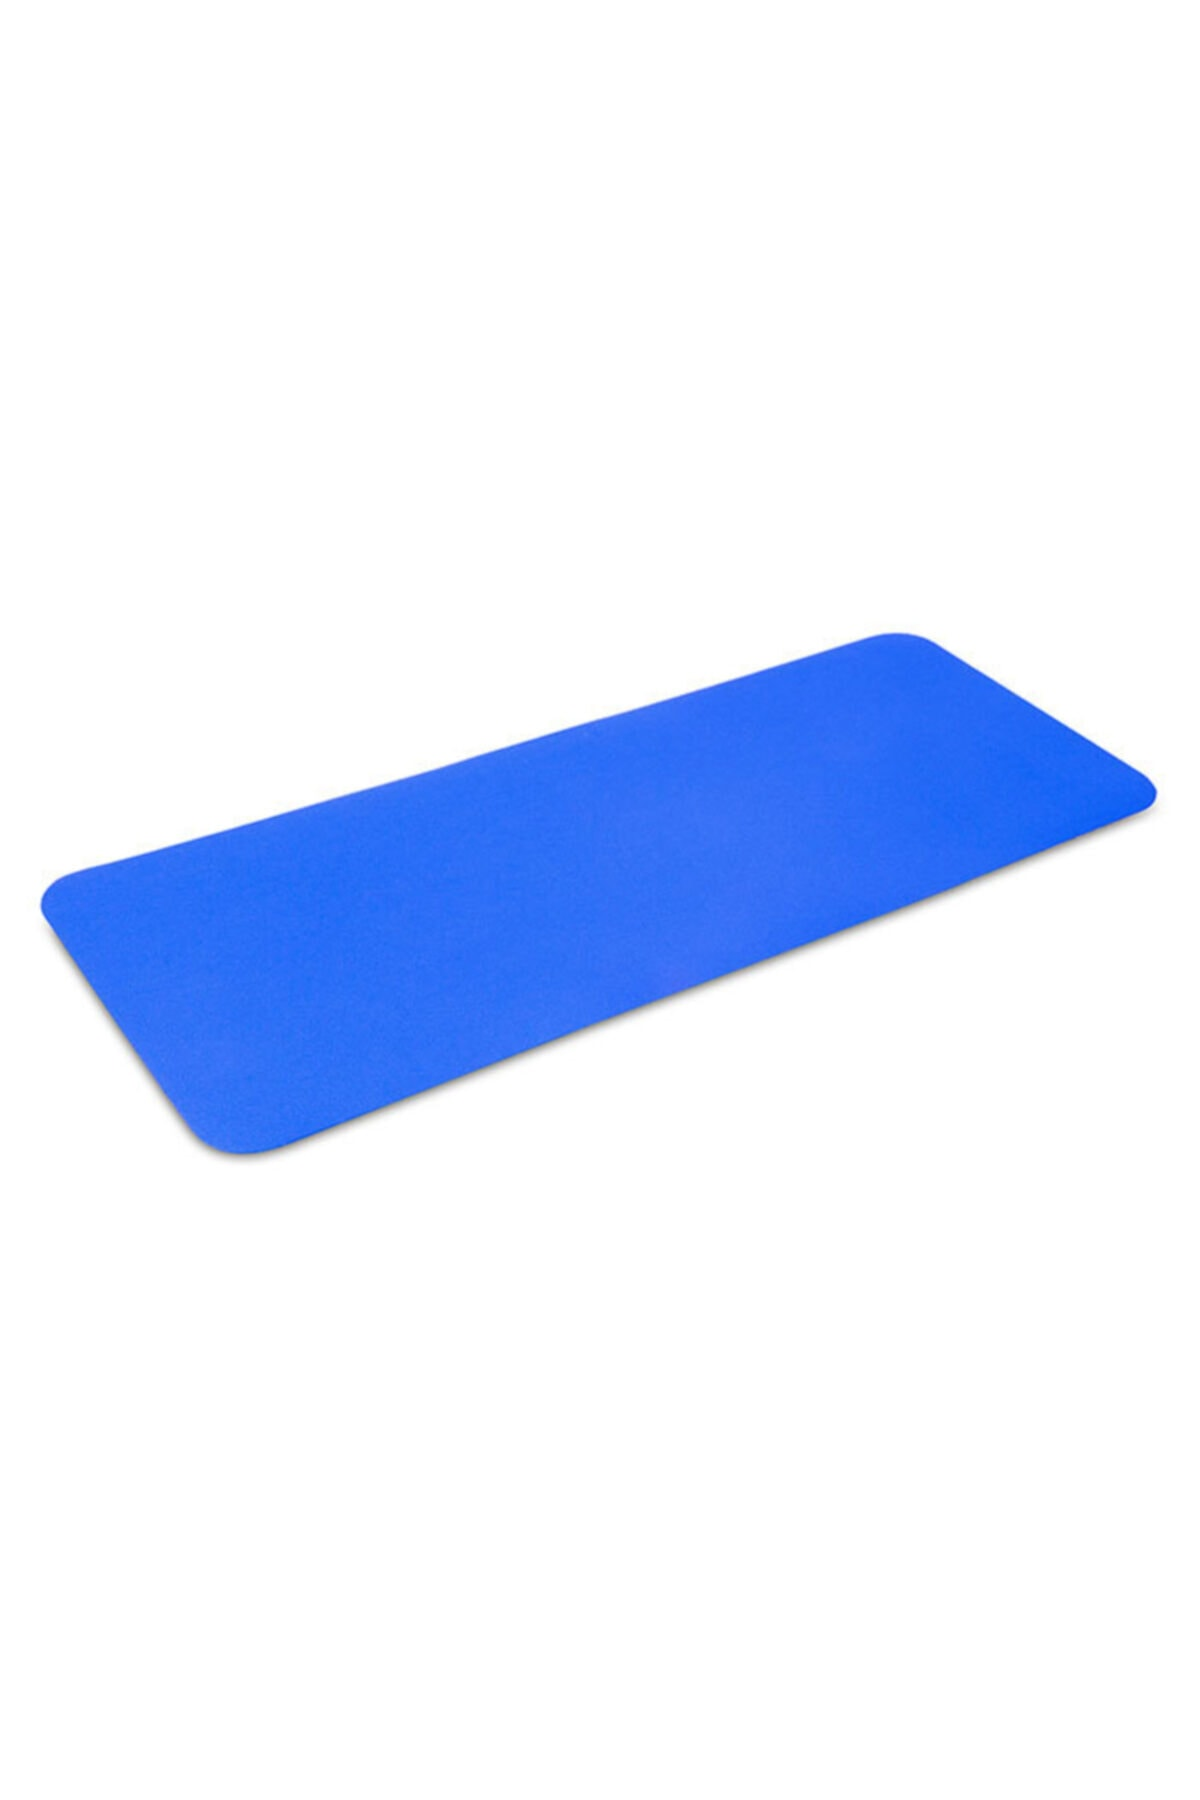 ADDISON 300271 Mavi 300*700*3mm Oyuncu Uzun Mouse Pad 1